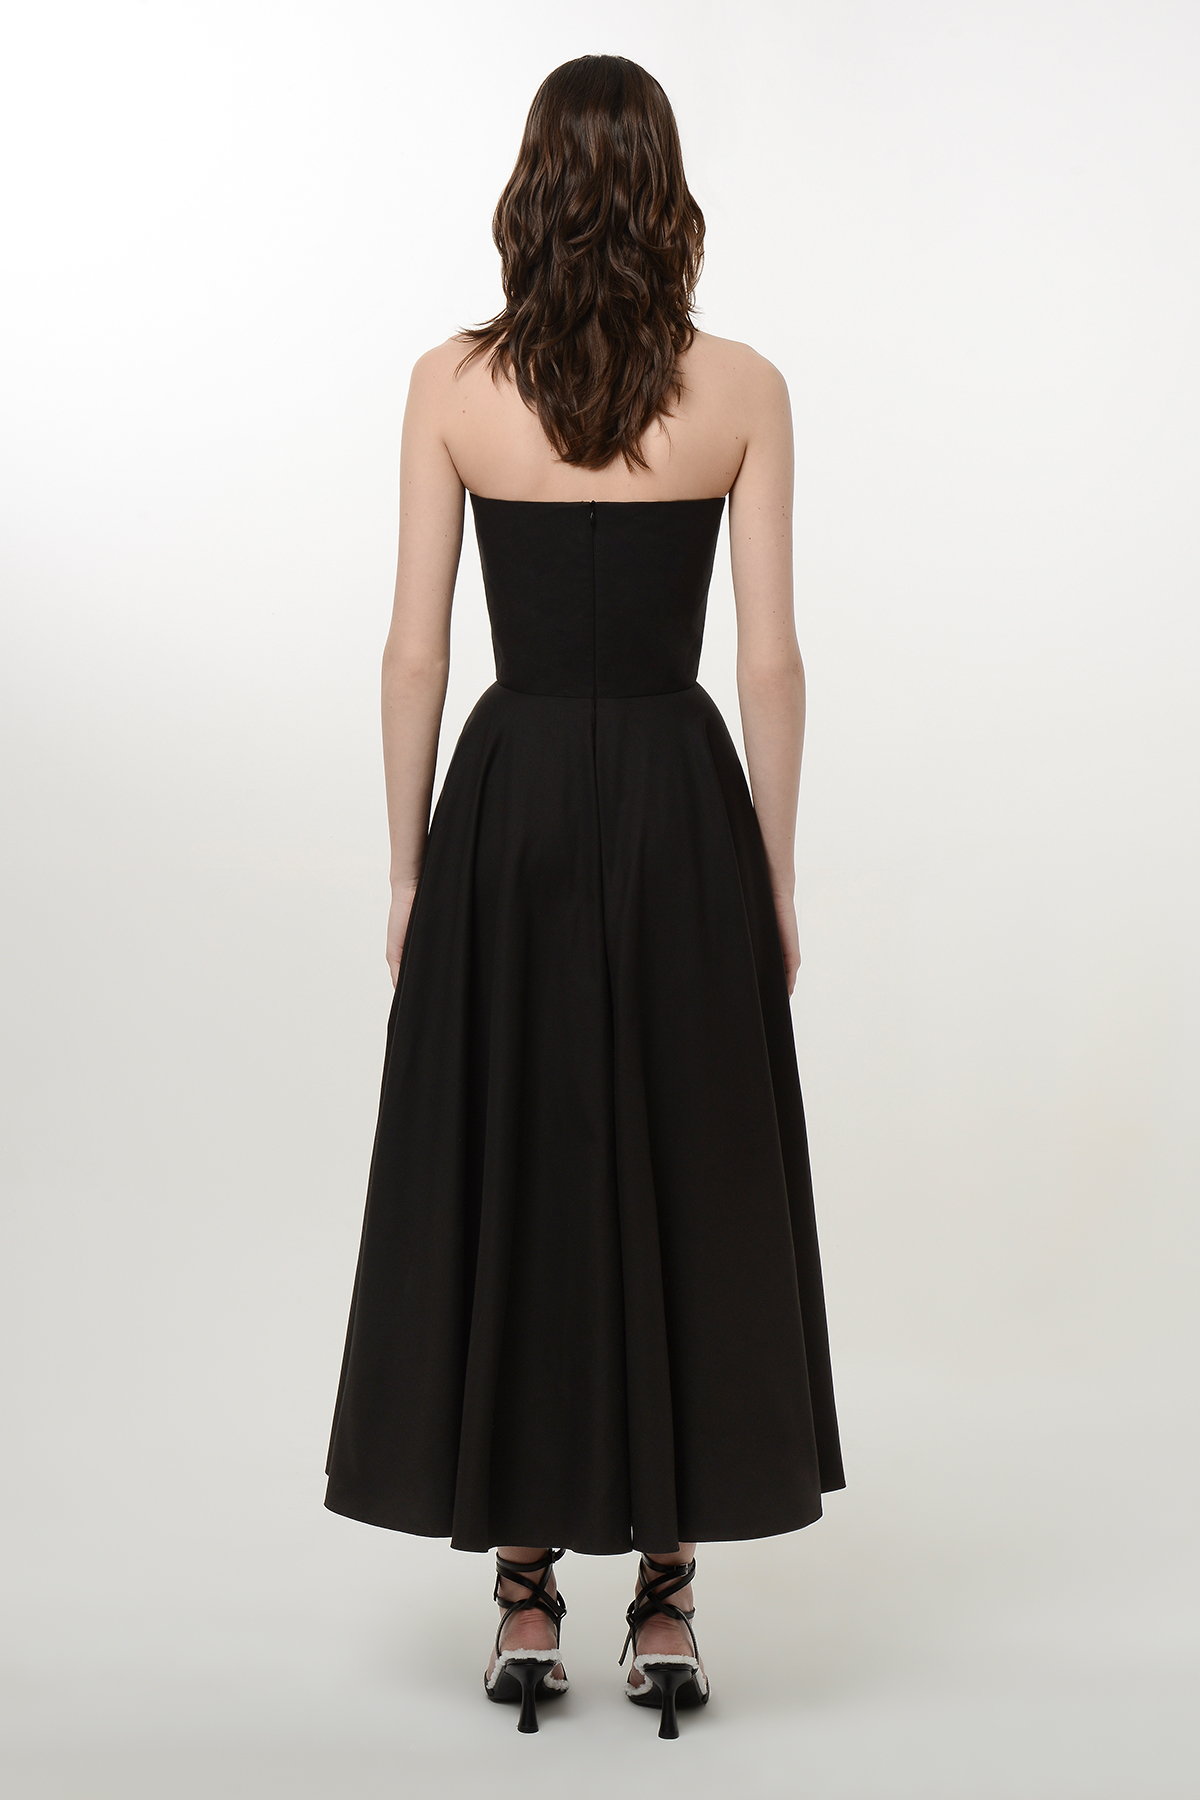 Corset style flare heart dress 2